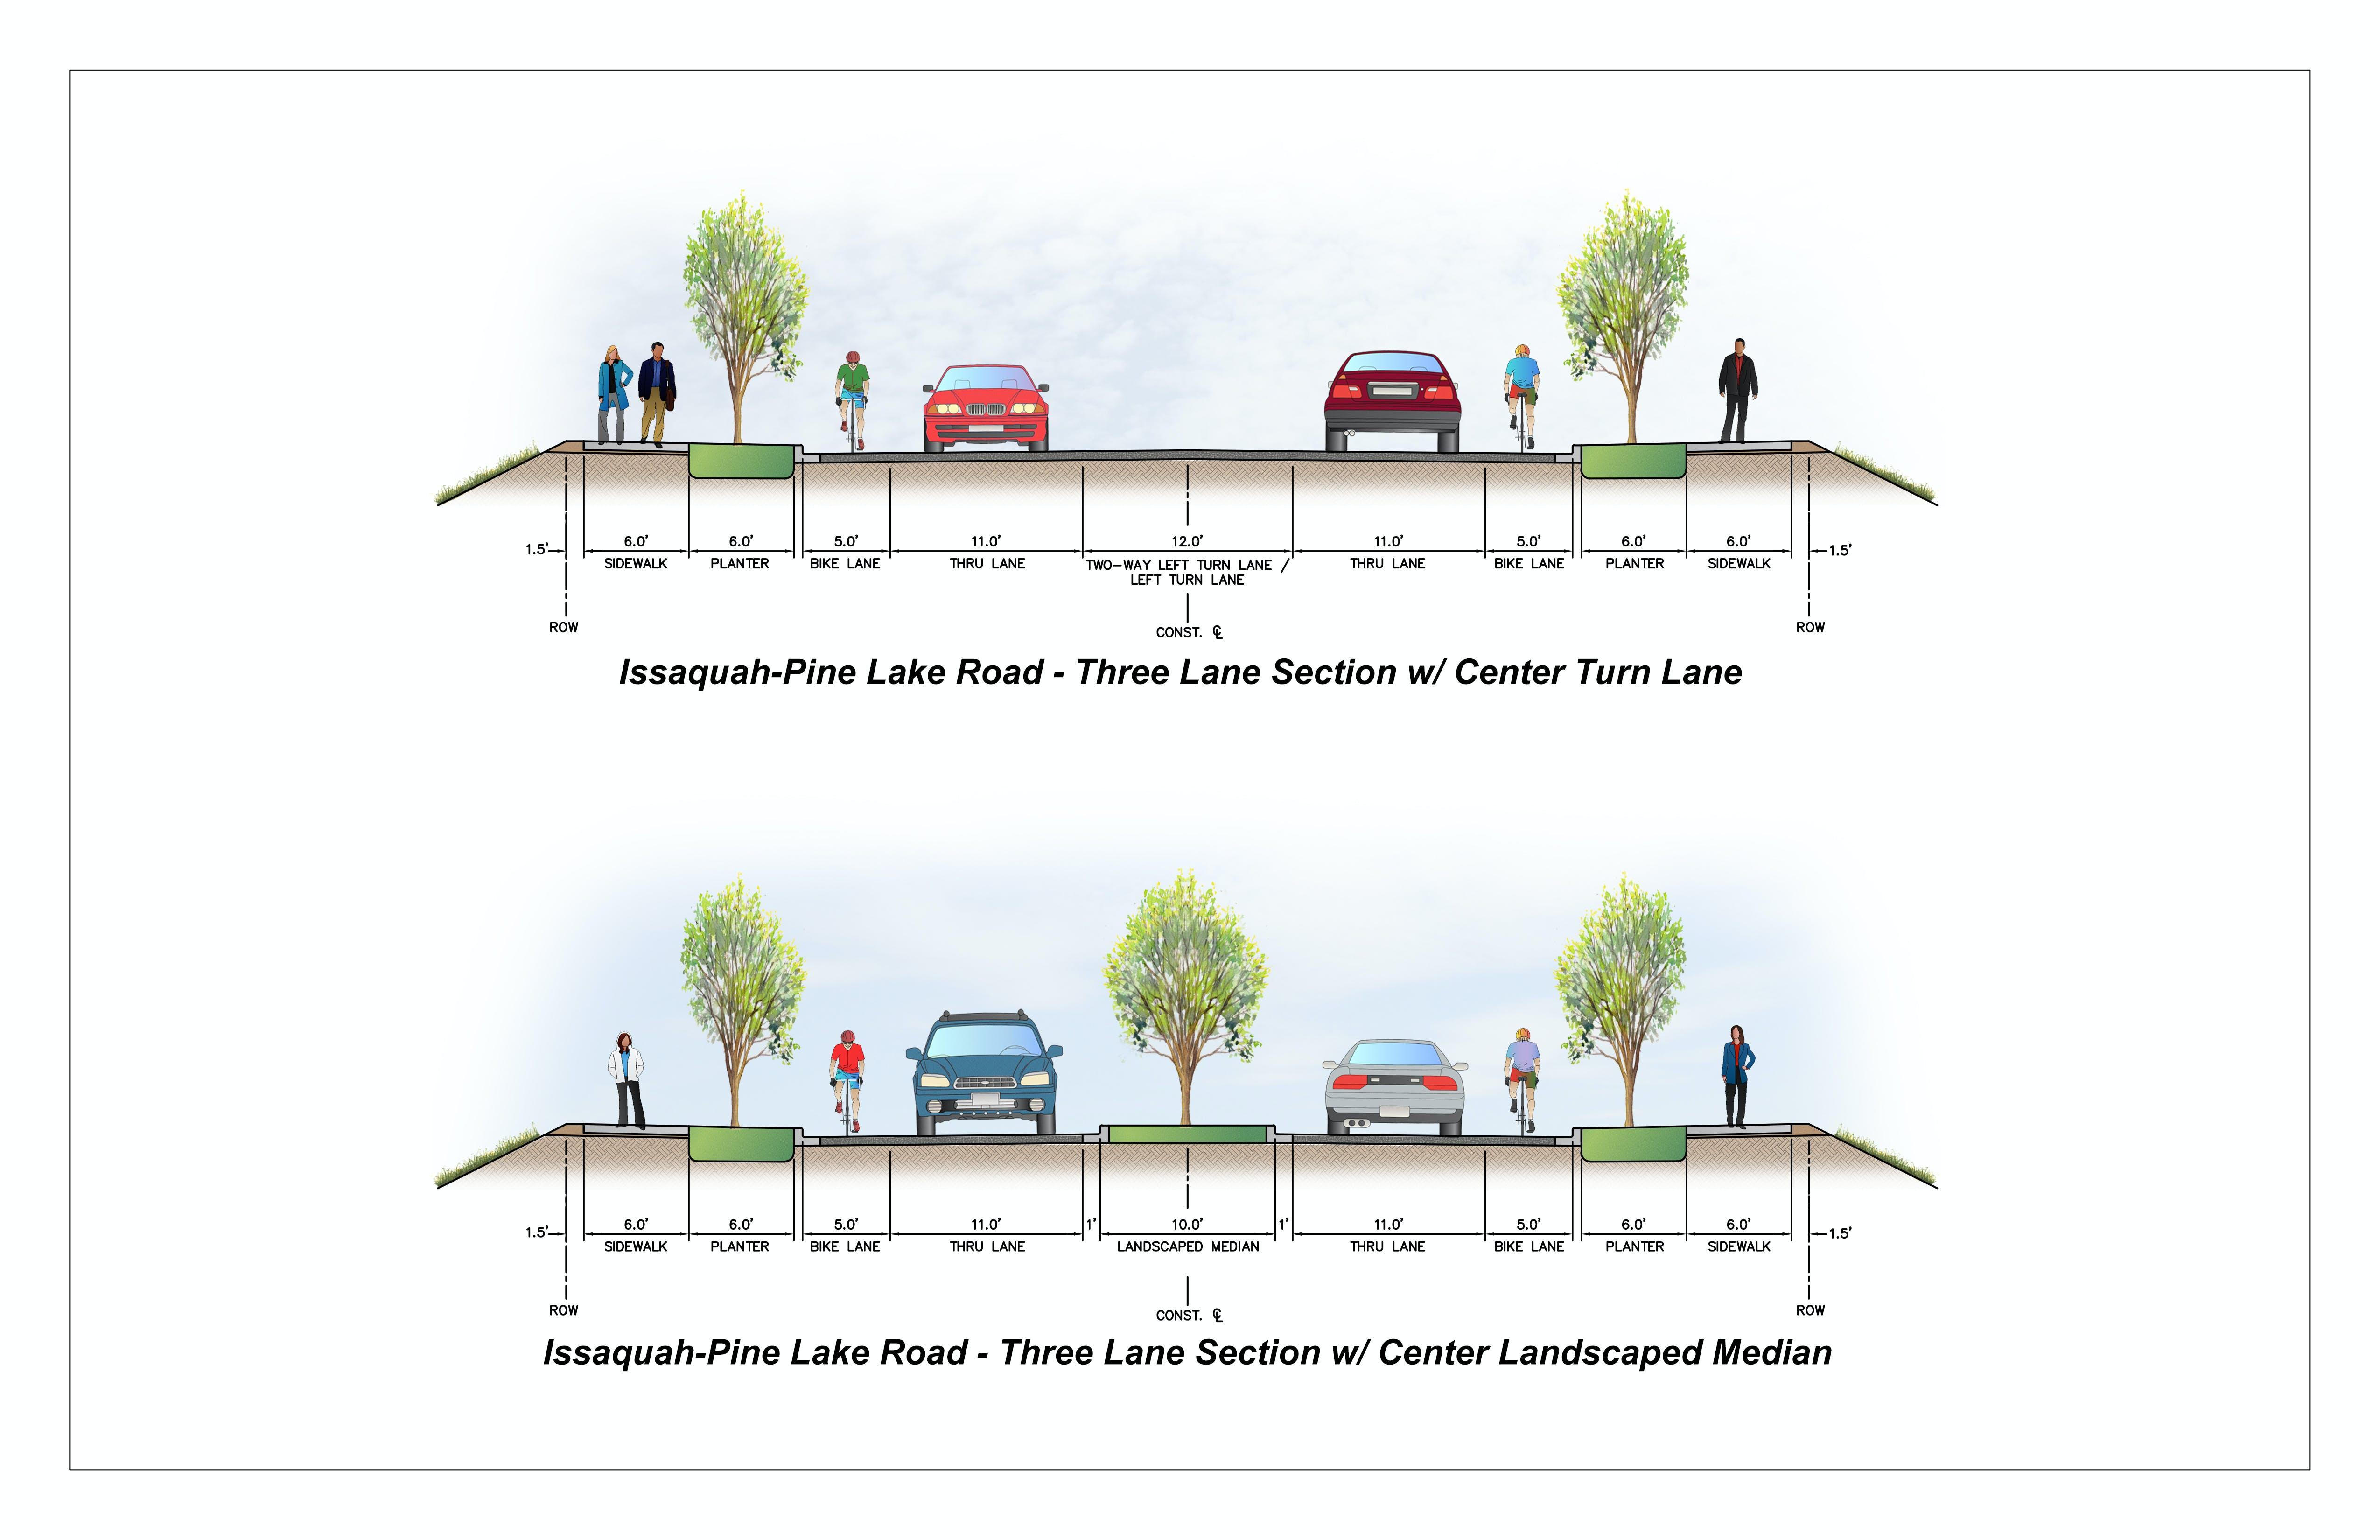 2020 0110 Iplr Roadway Cross Sections